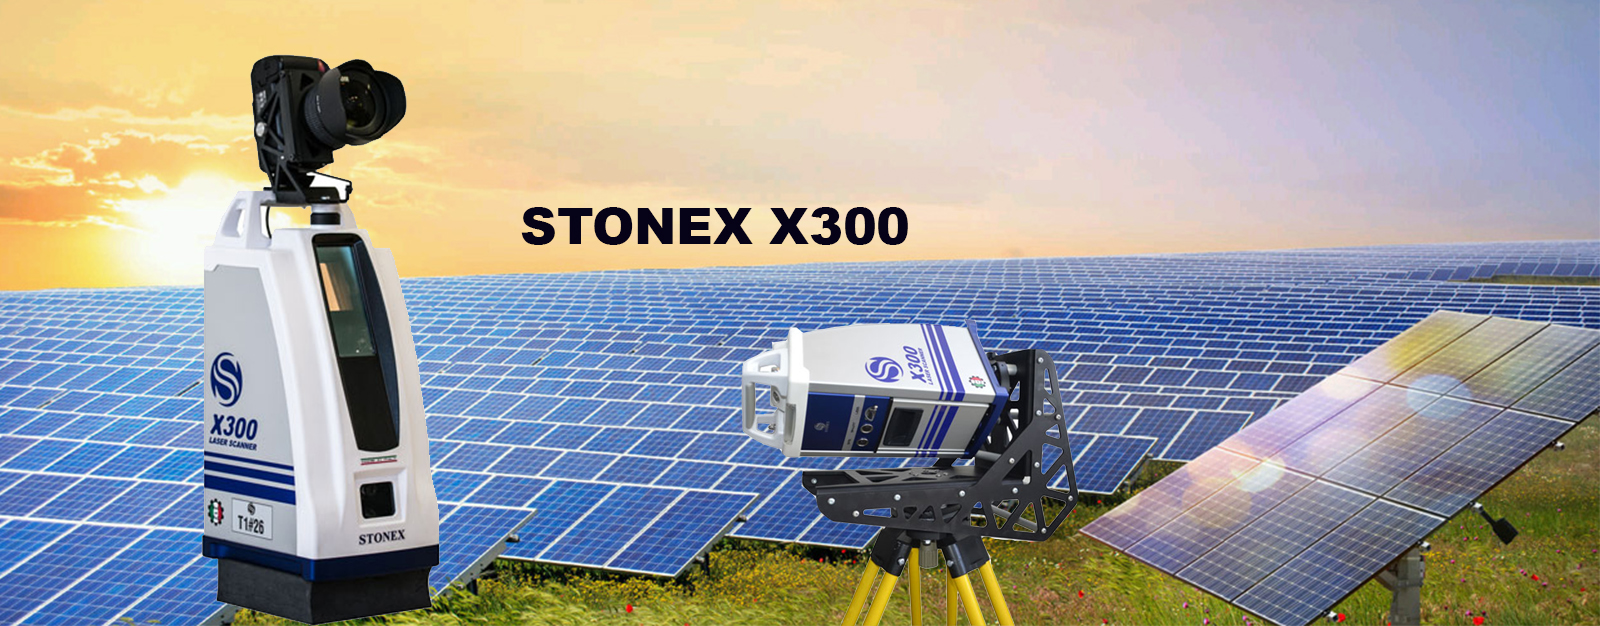 X300SCANNER